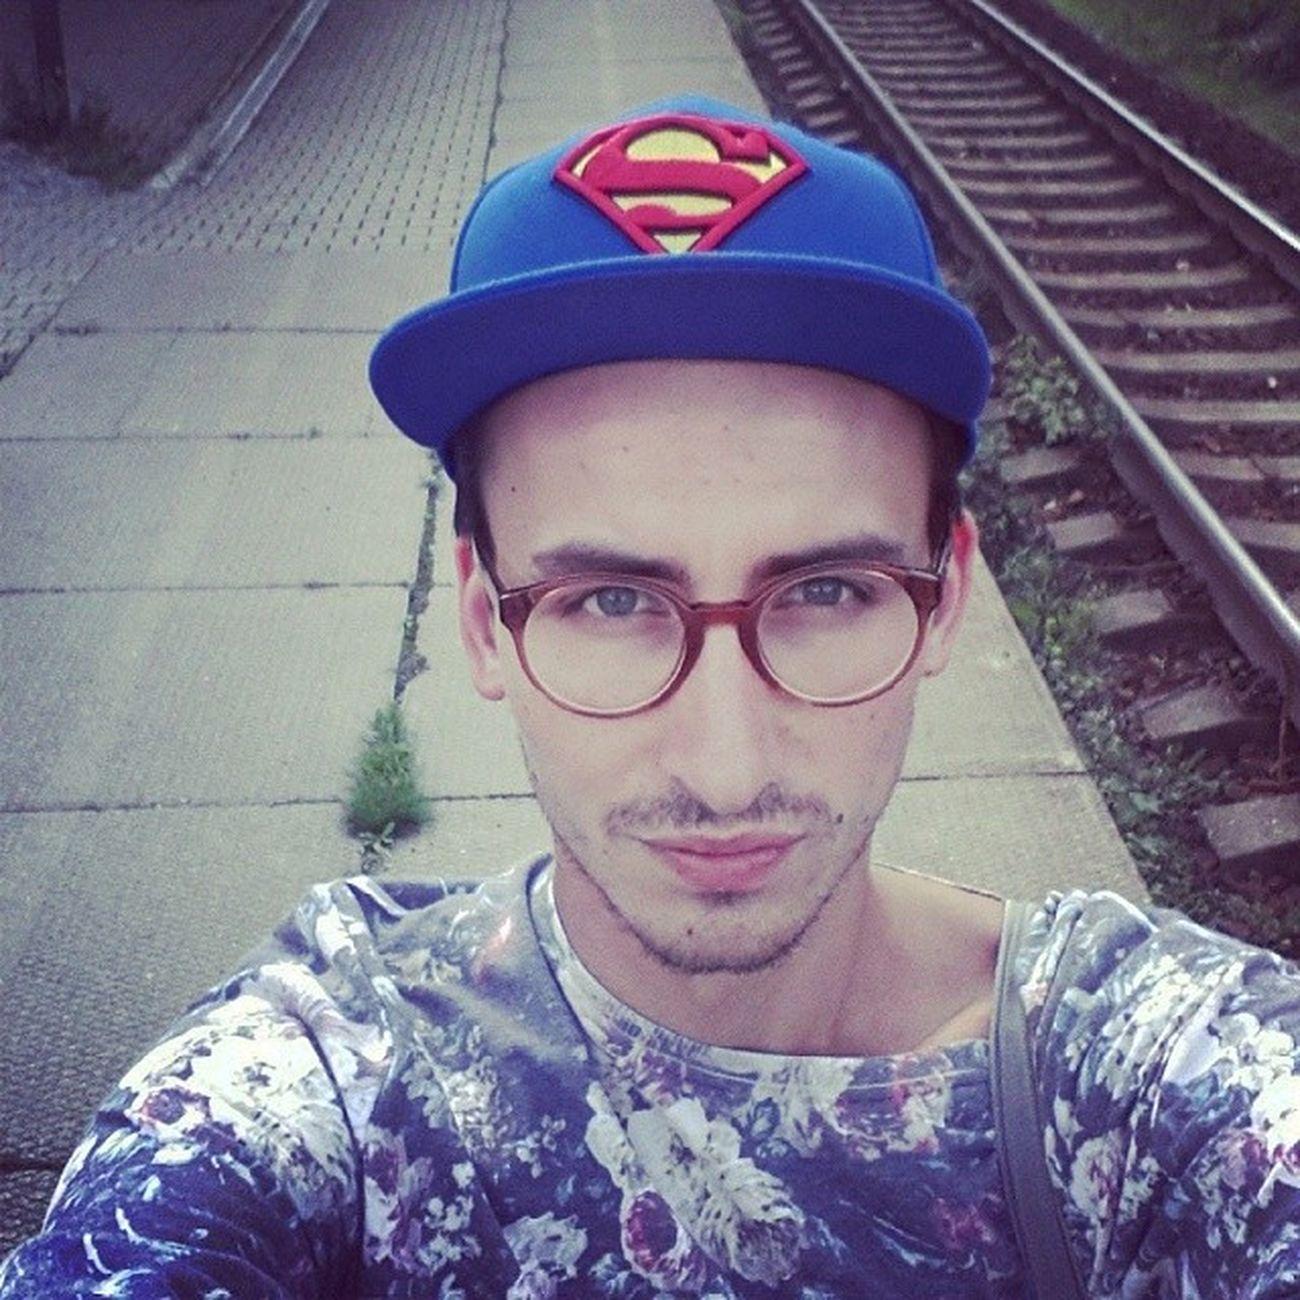 Superman Clarkkent Oscarmagnusson Guy polishboy